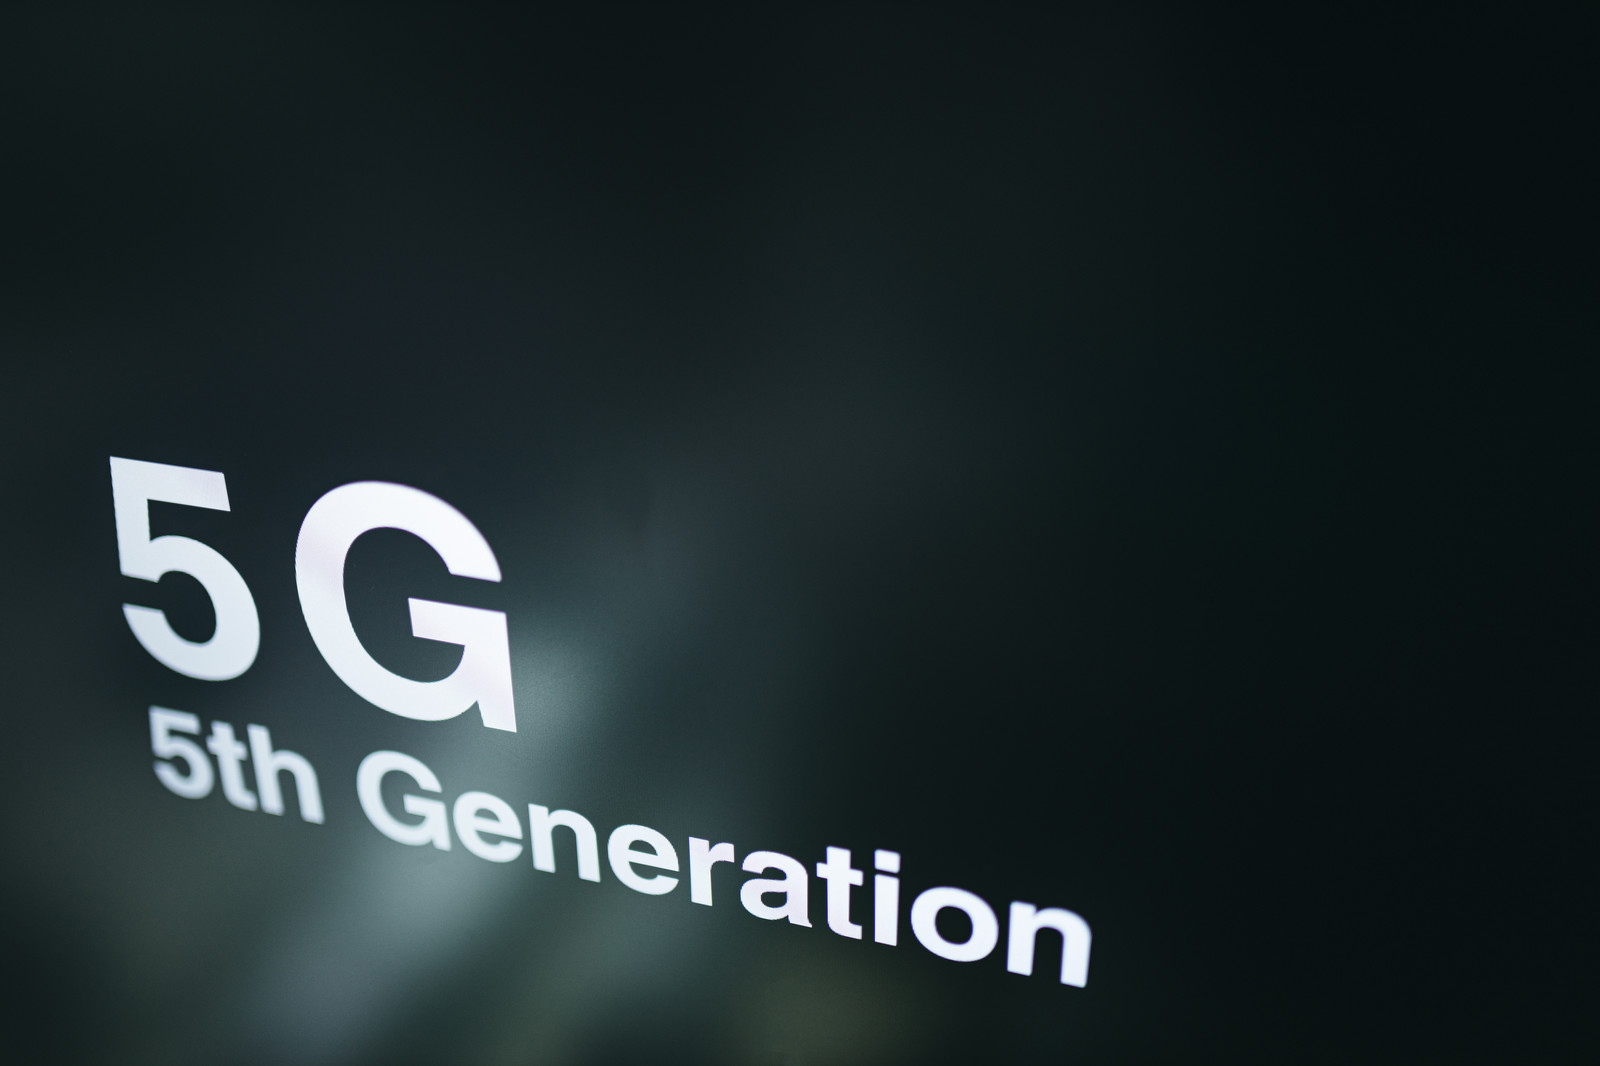 5Gのスゴさ(第5世代移動通信システム)のフリー素材